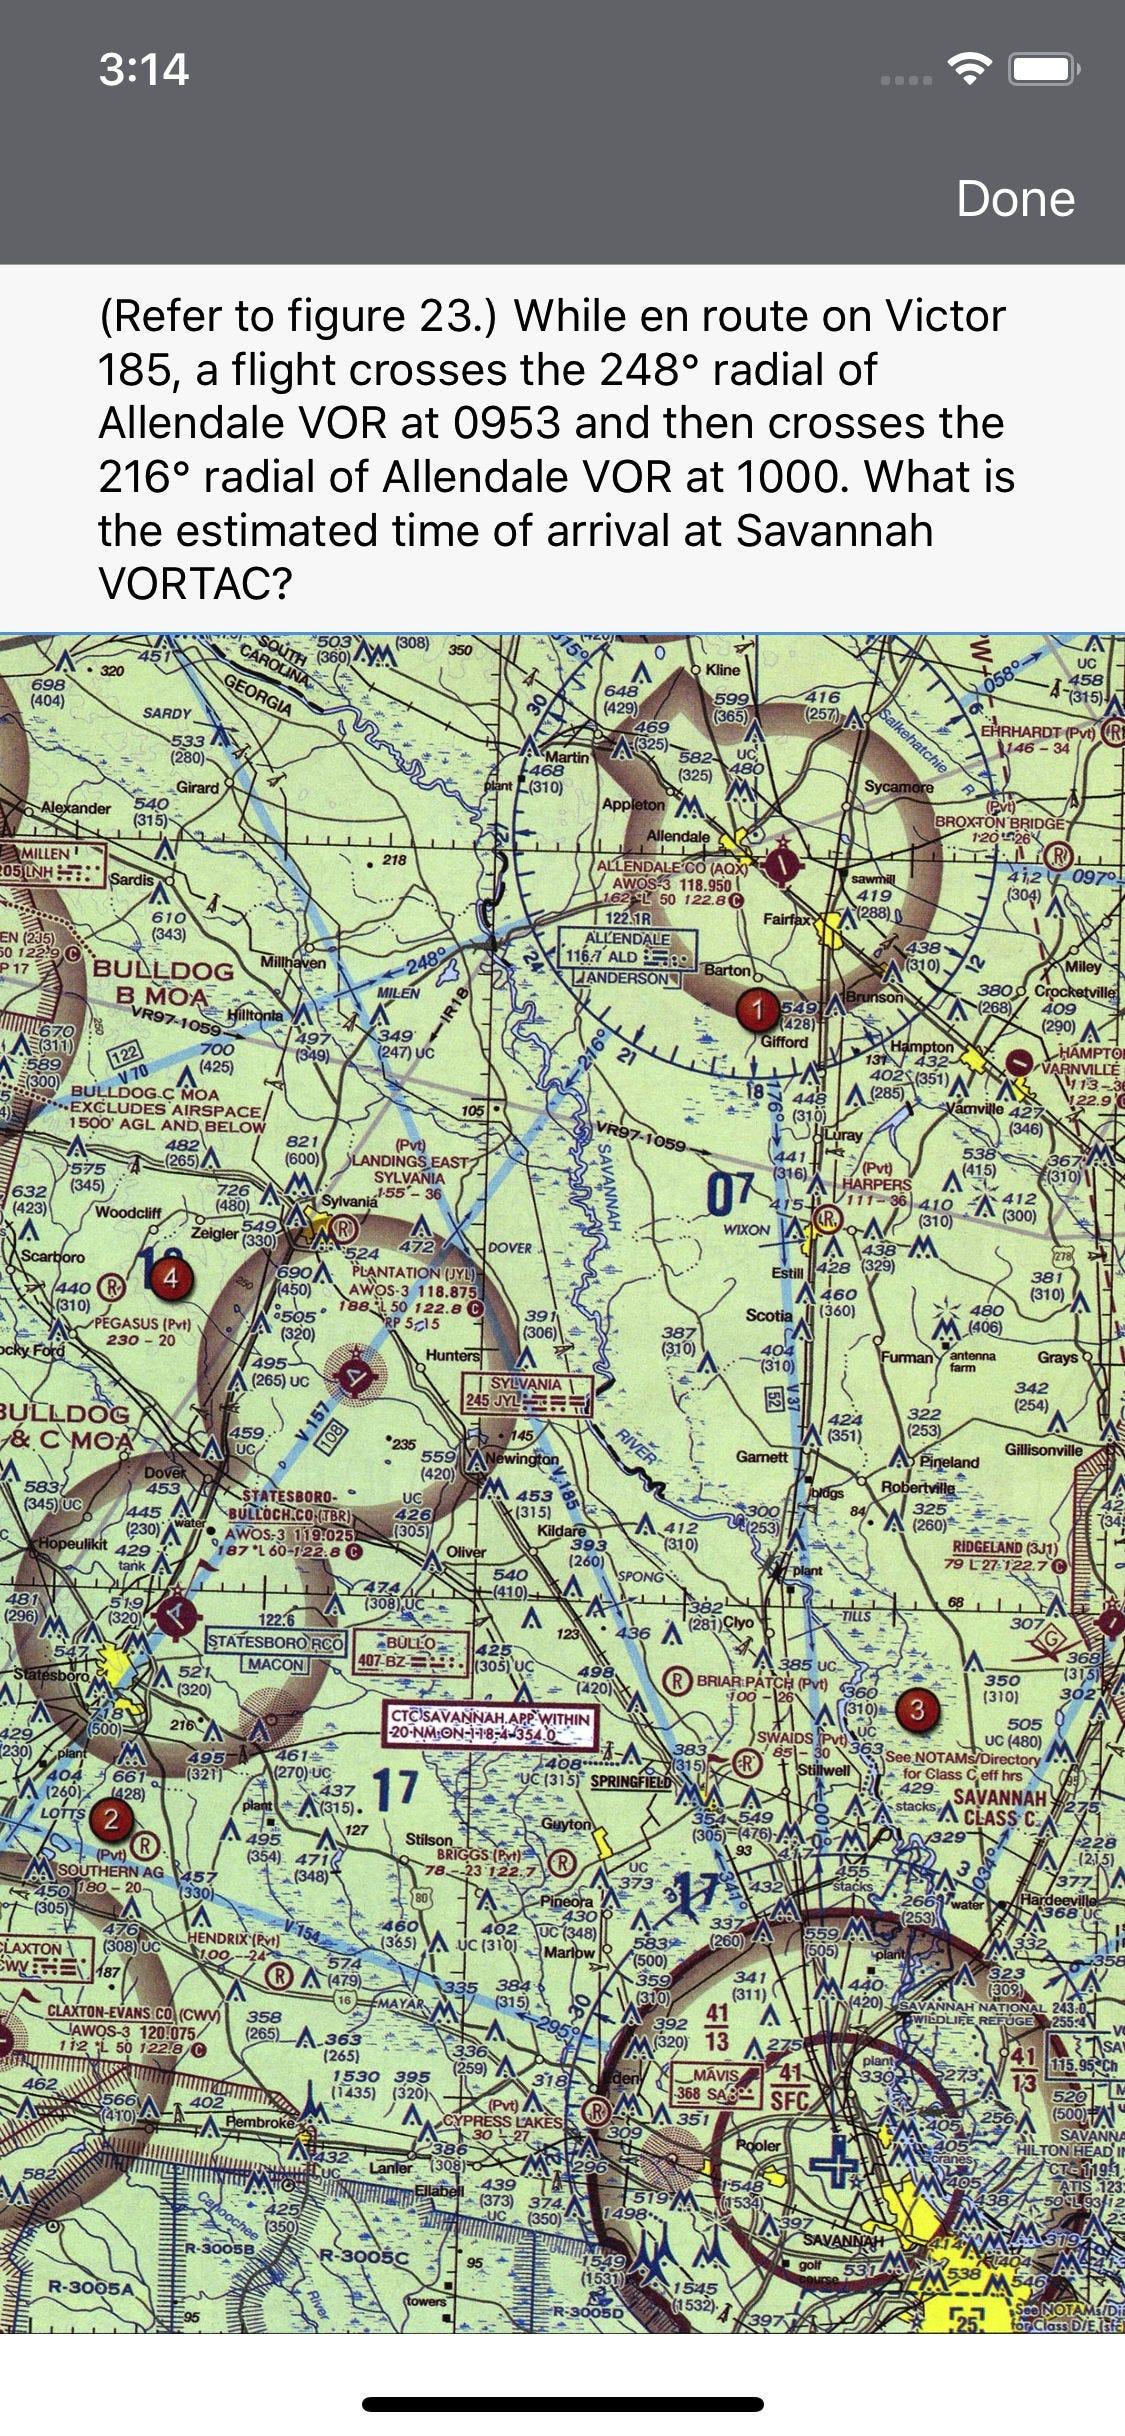 Sporty\'s Study Buddy™ iPhone/iPad Aviation App (Private Pilot ...